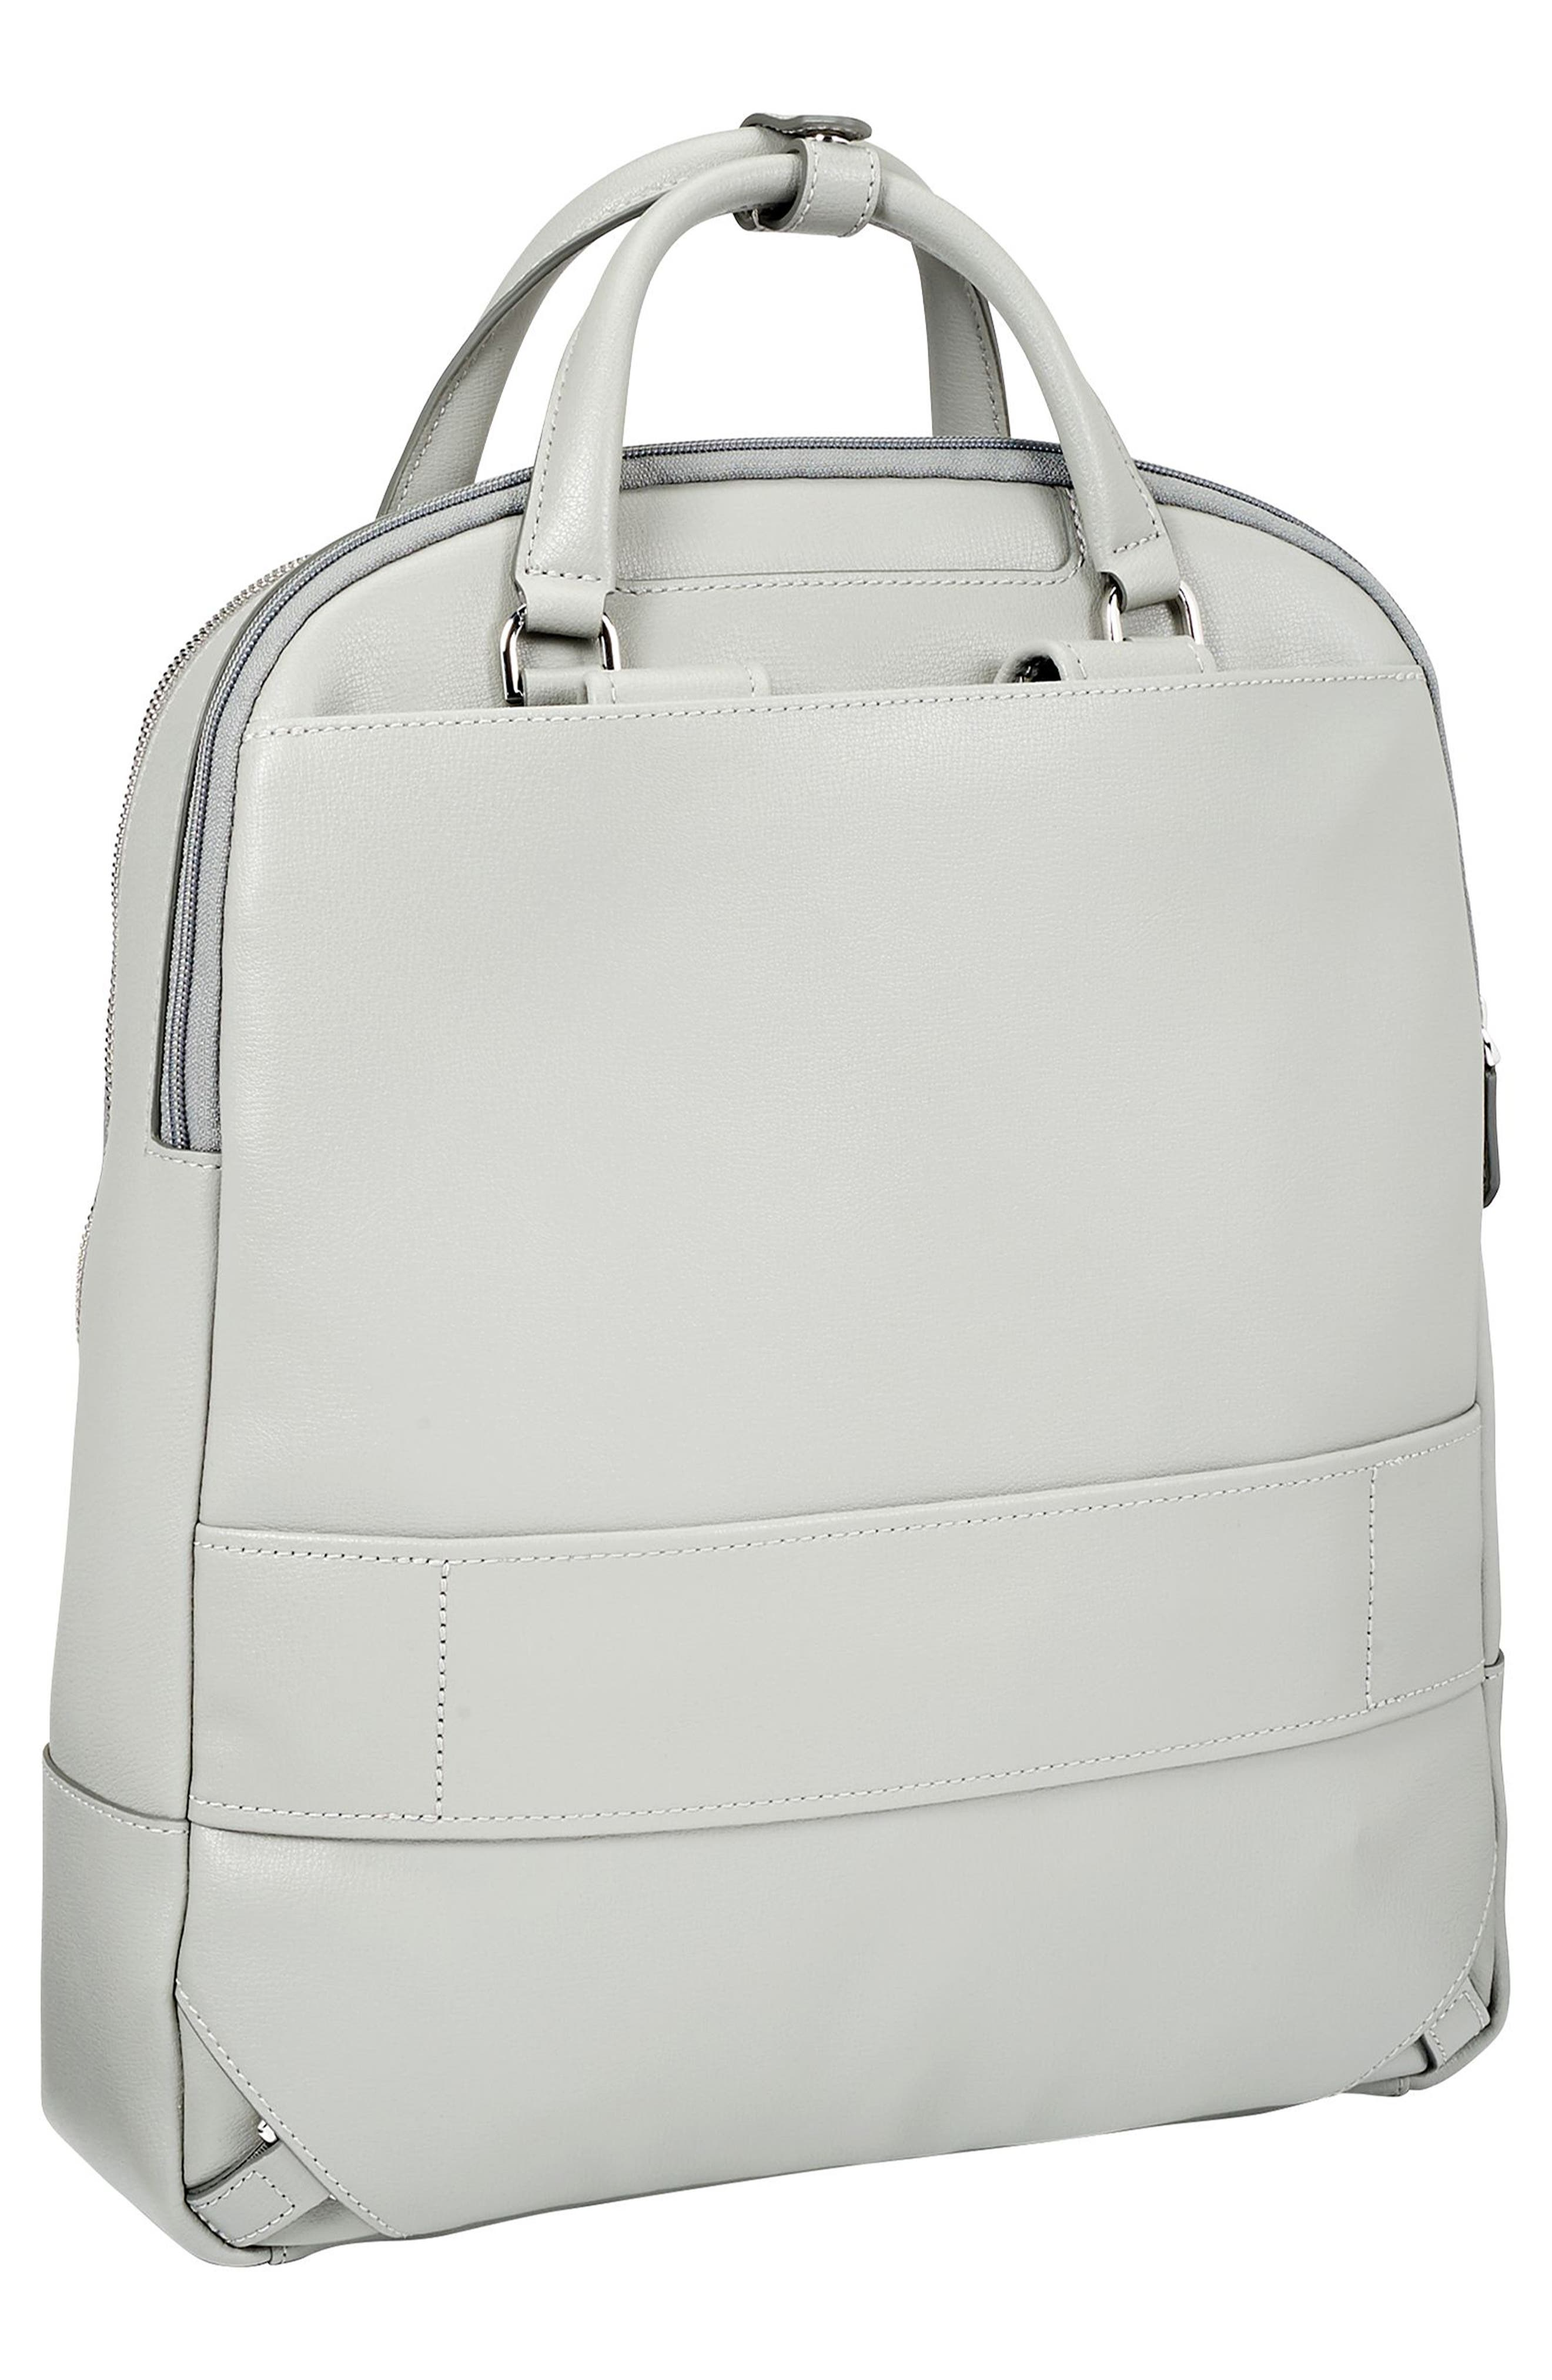 Stanton Orion Leather Backpack,                             Alternate thumbnail 4, color,                             Light Grey